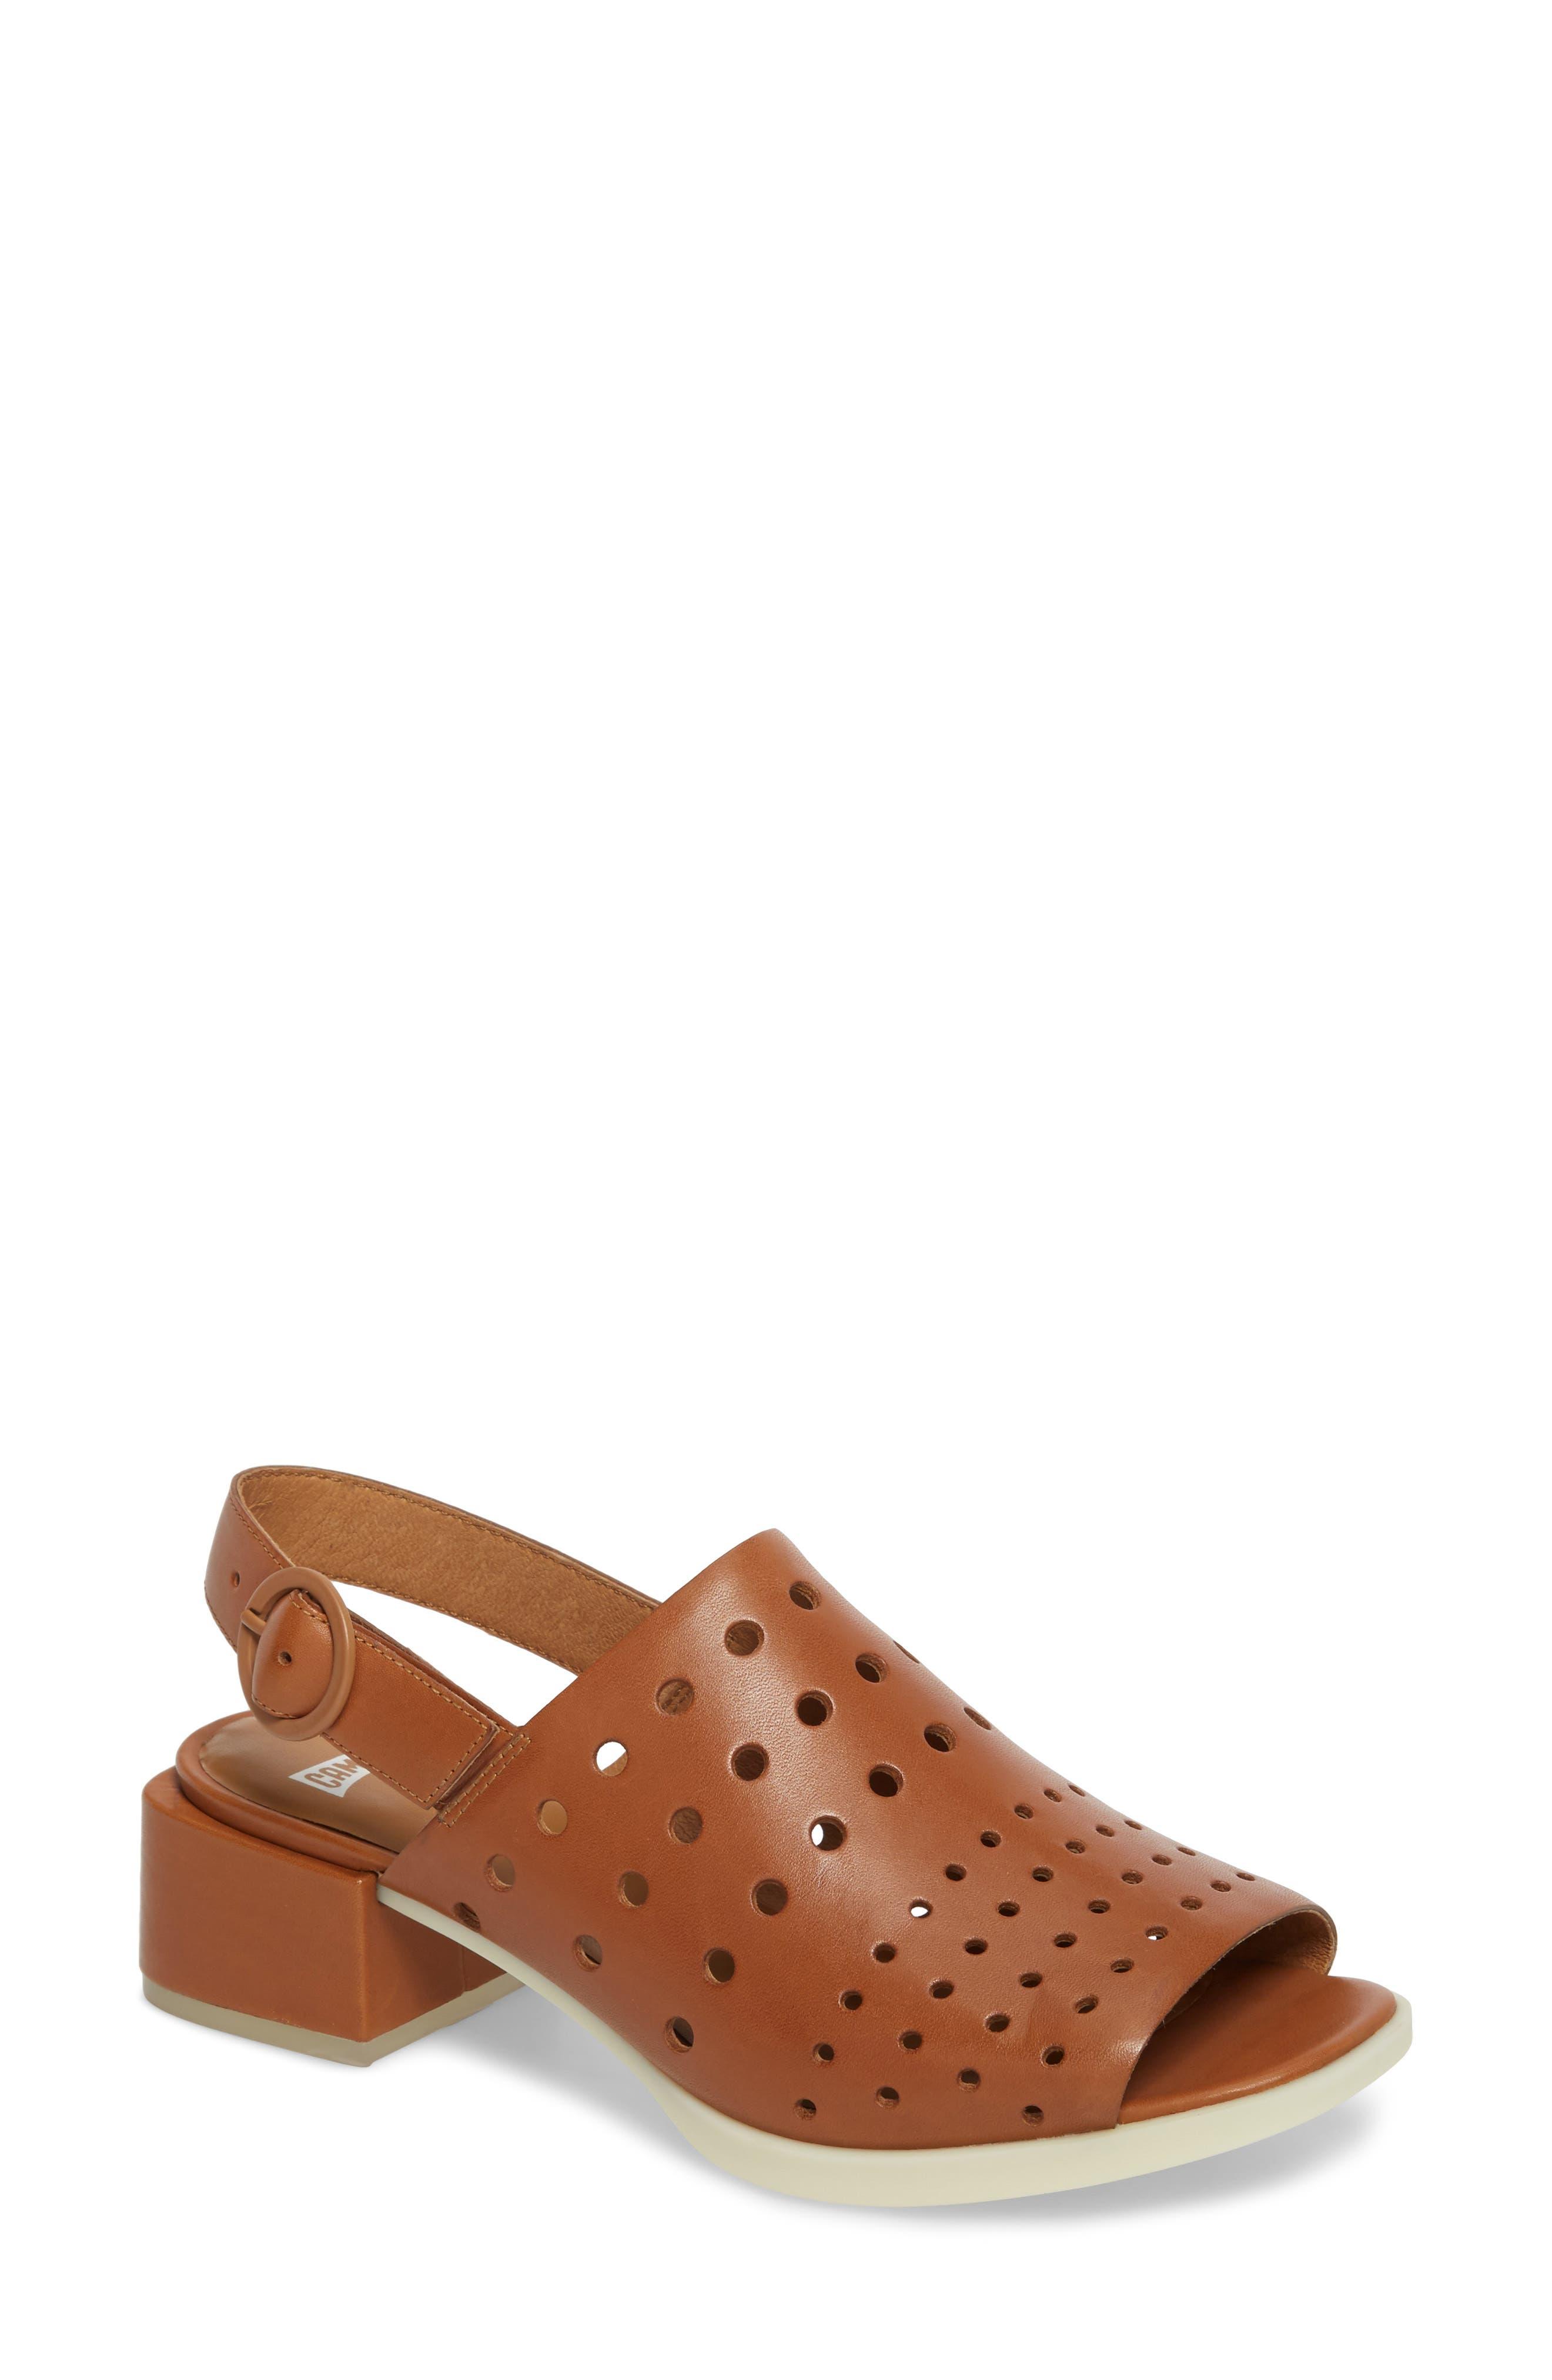 Twins Sandal,                         Main,                         color, Rust/ Copper Leather